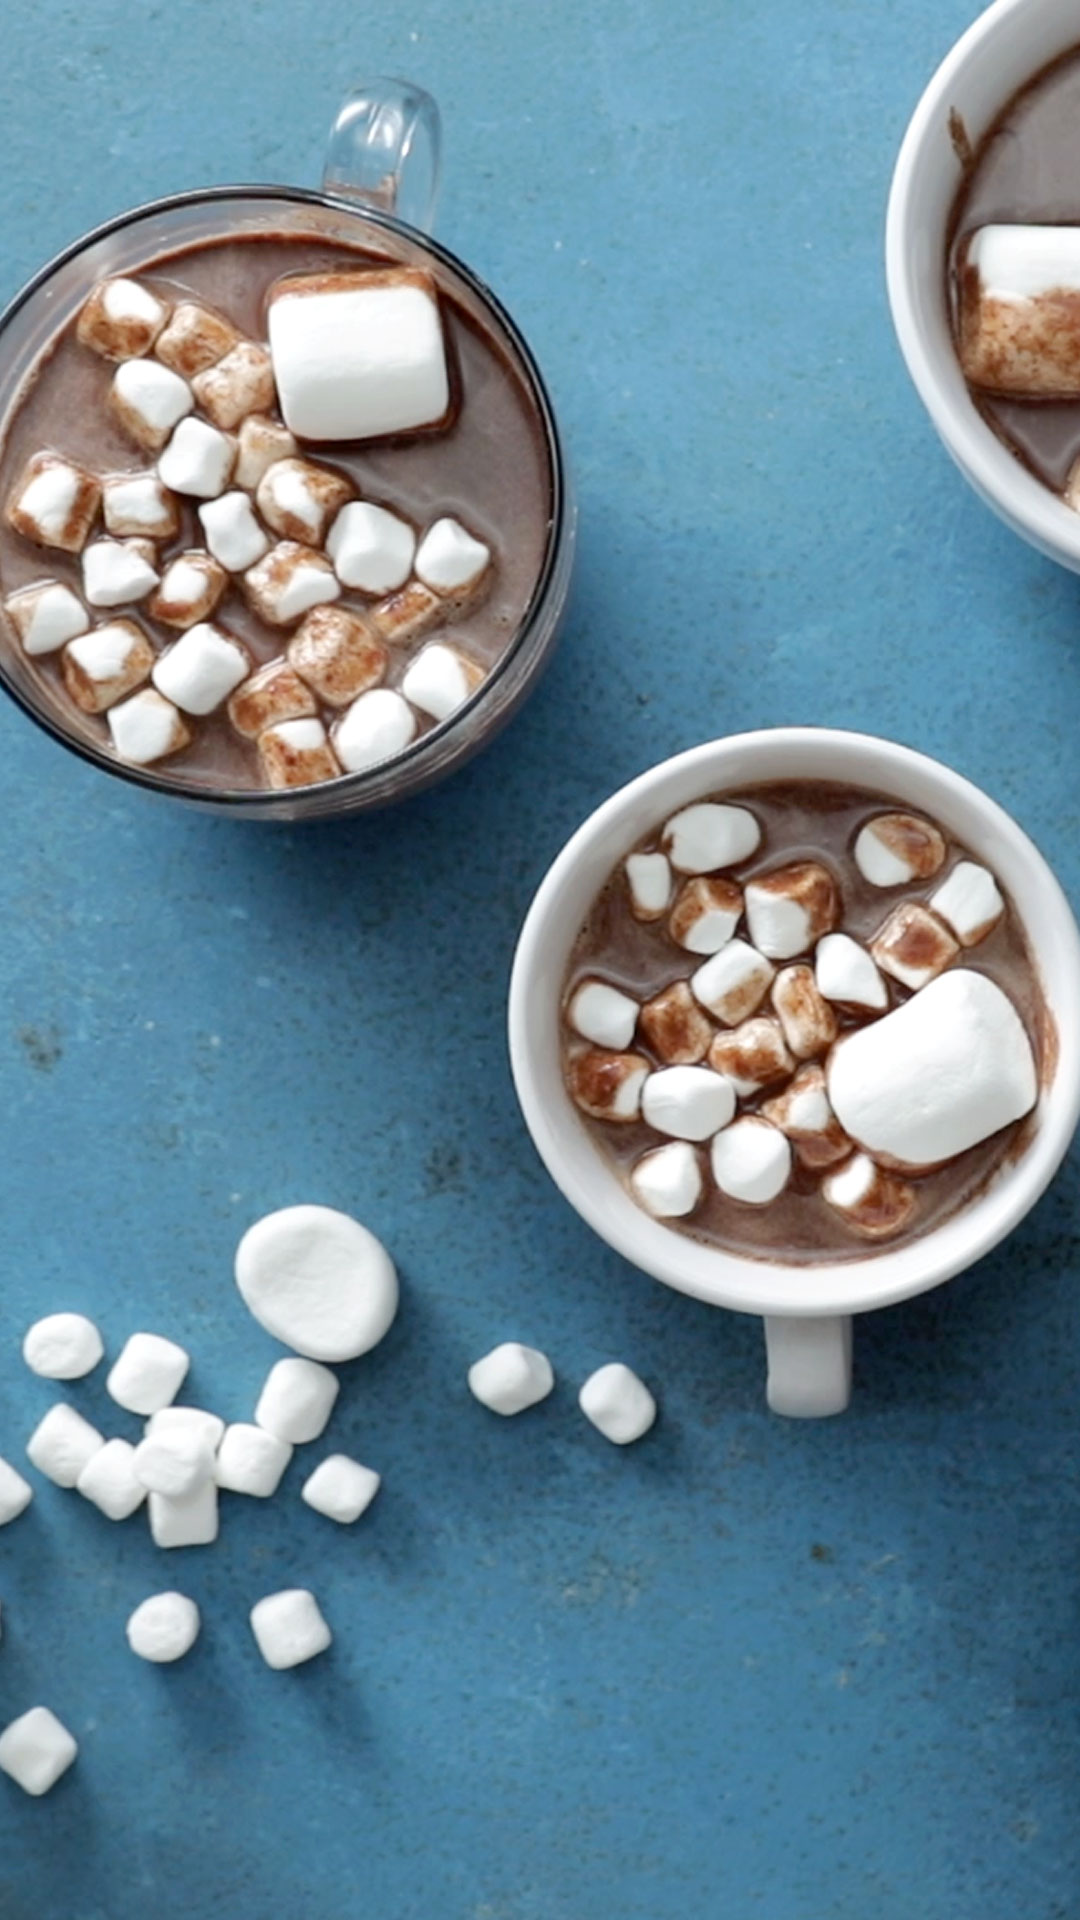 7 Hot Chocolate Hacks